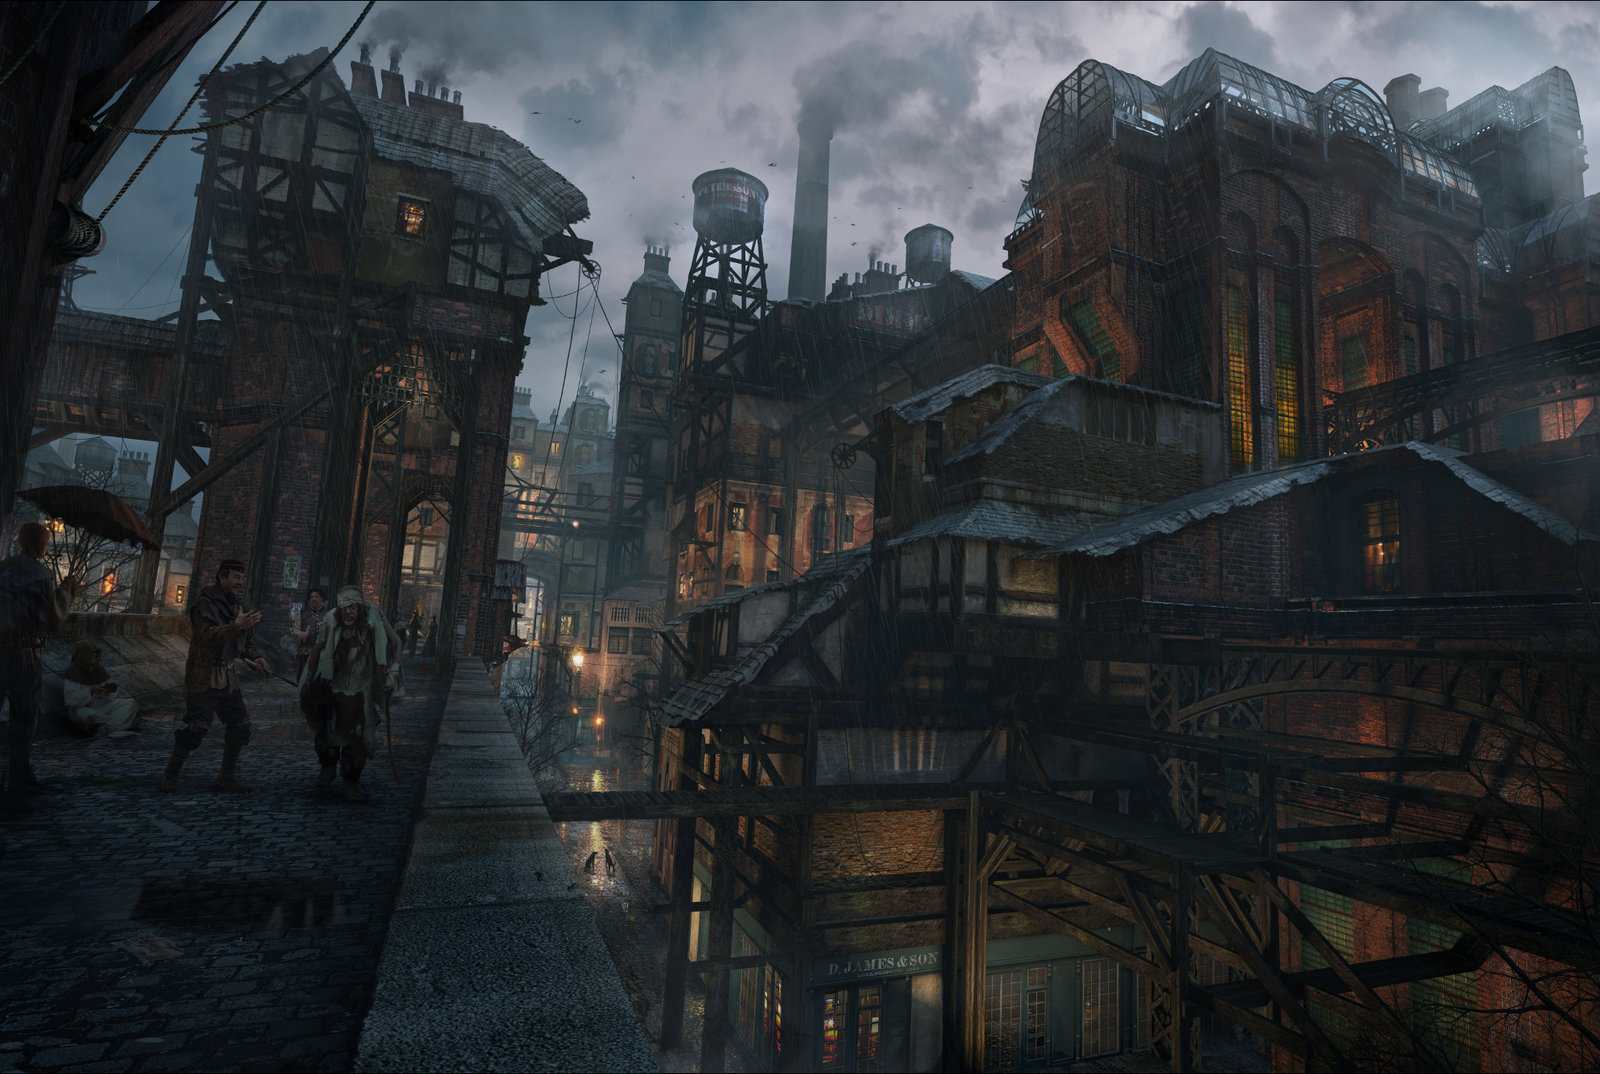 https://cdna.artstation.com/p/assets/images/images/000/122/848/medium/dmitry-zaviyalov-blighttown.jpg?1404336826